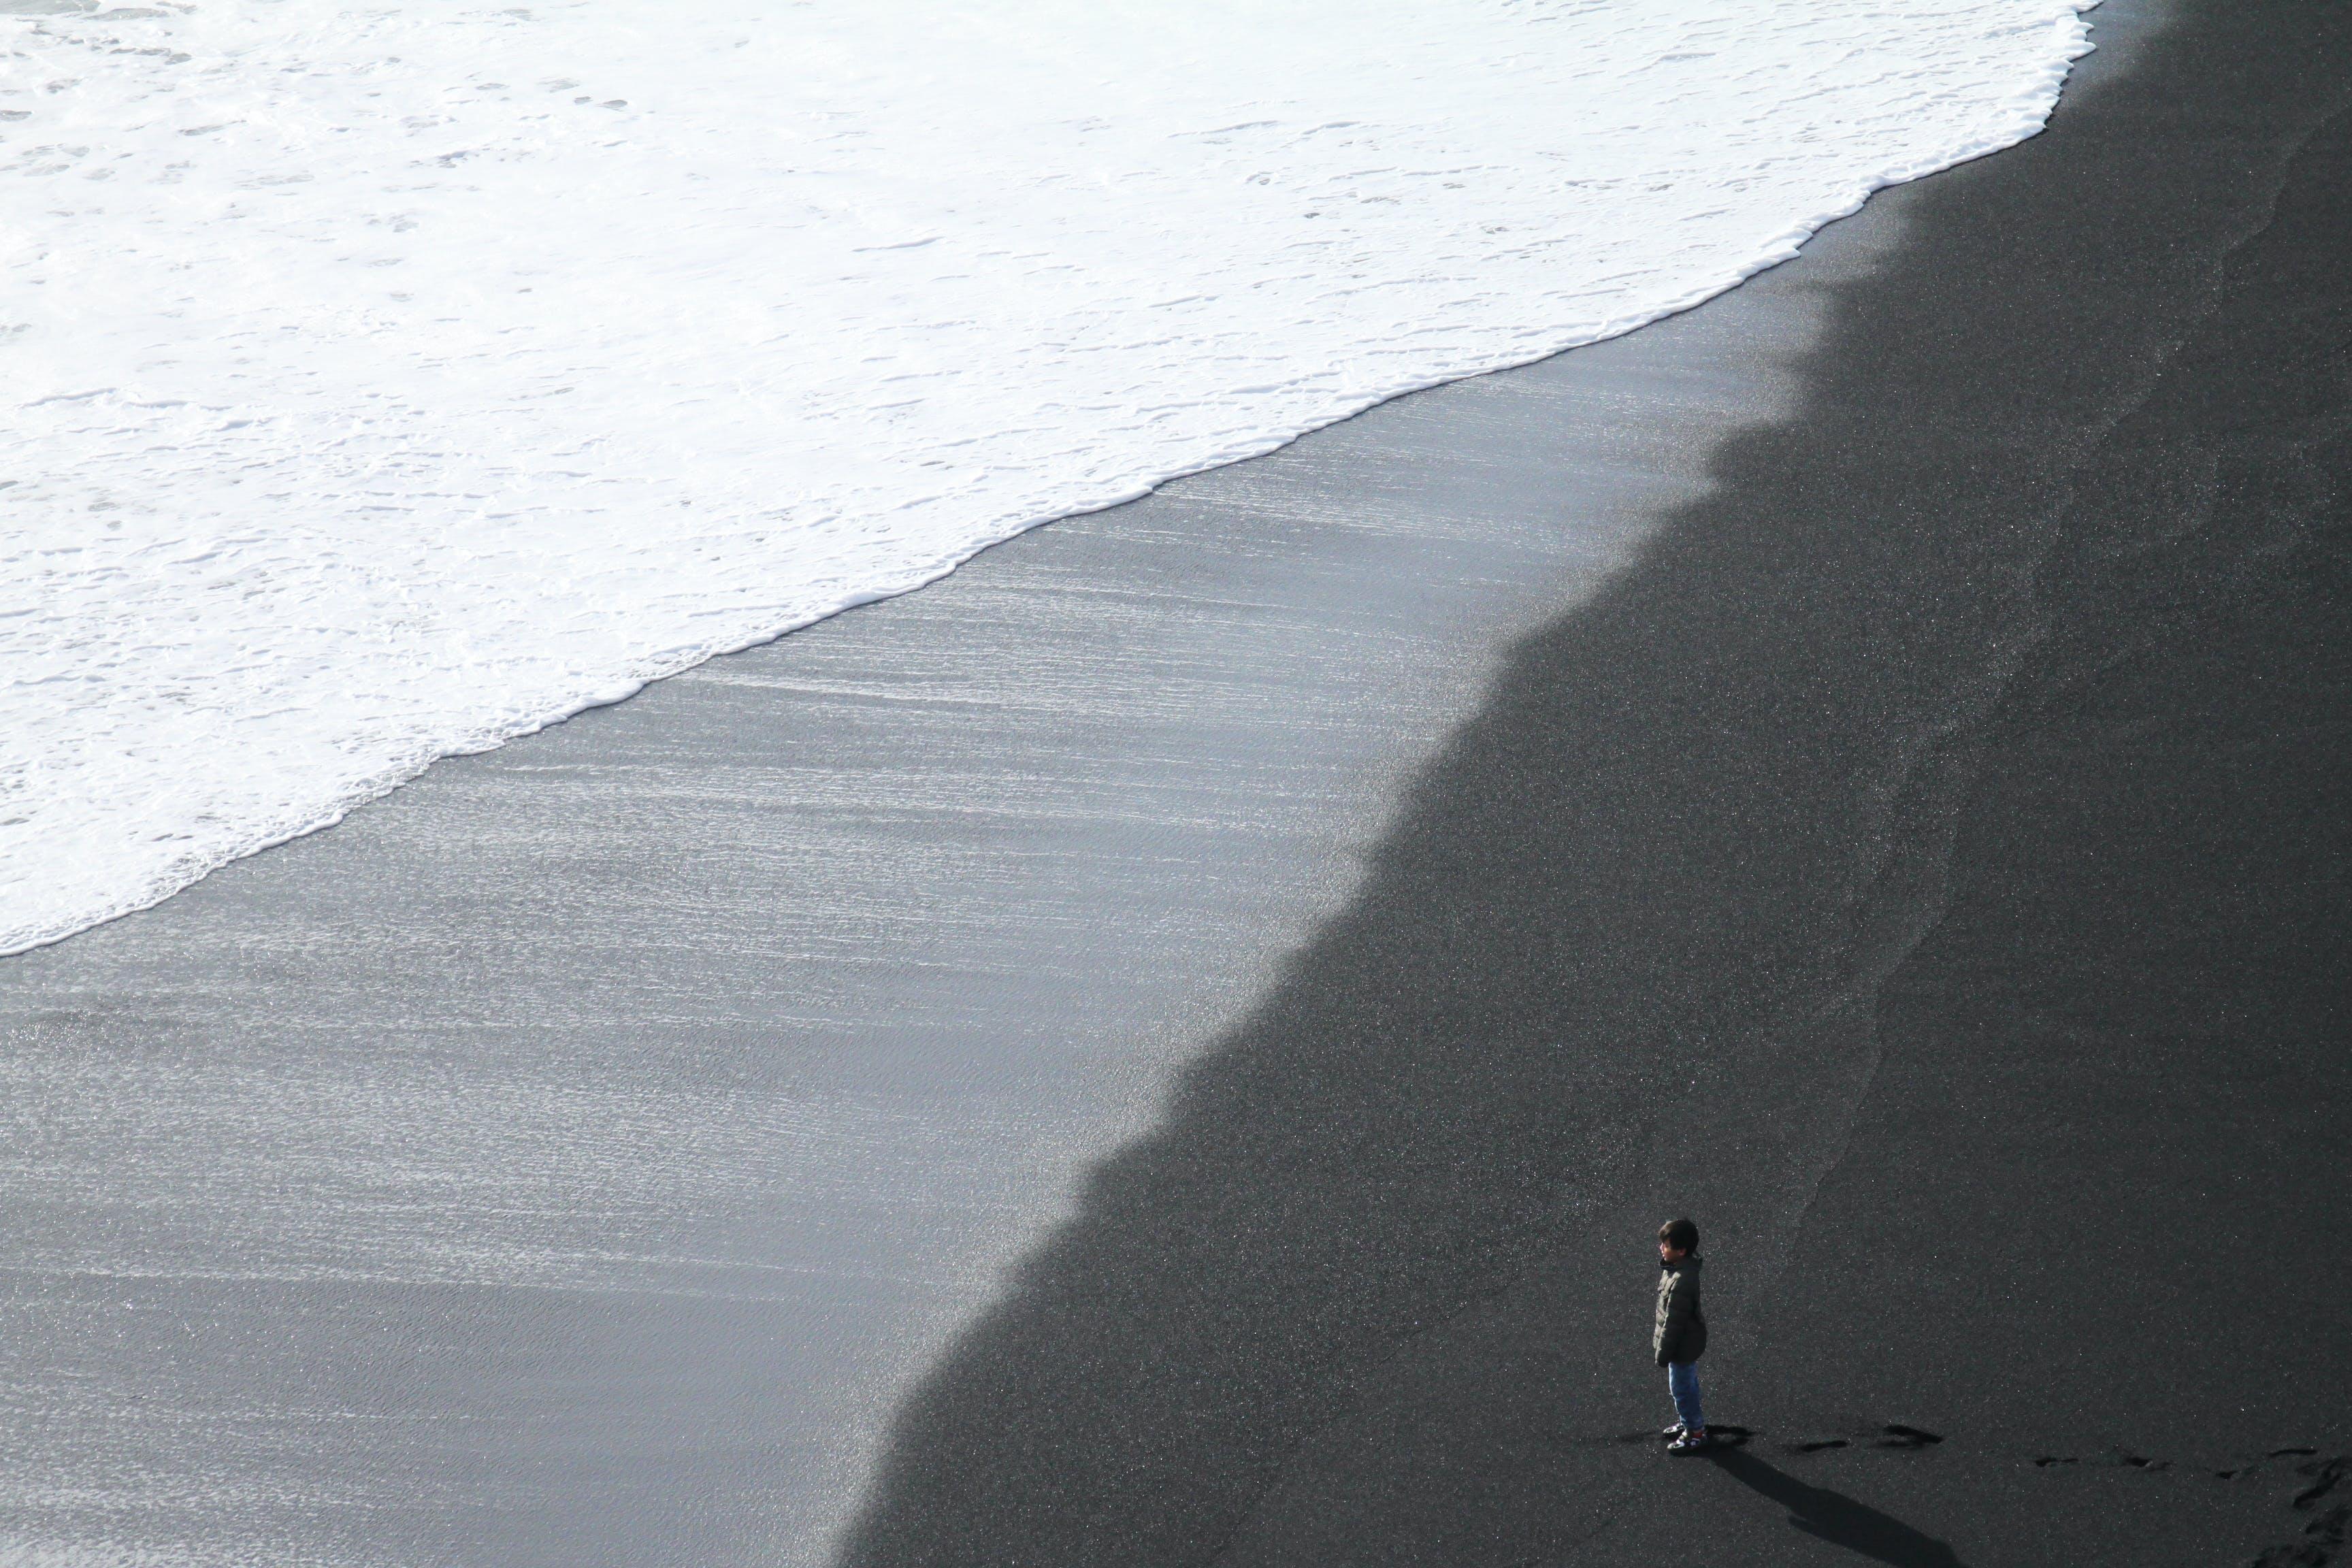 Child Standing on the Seashore